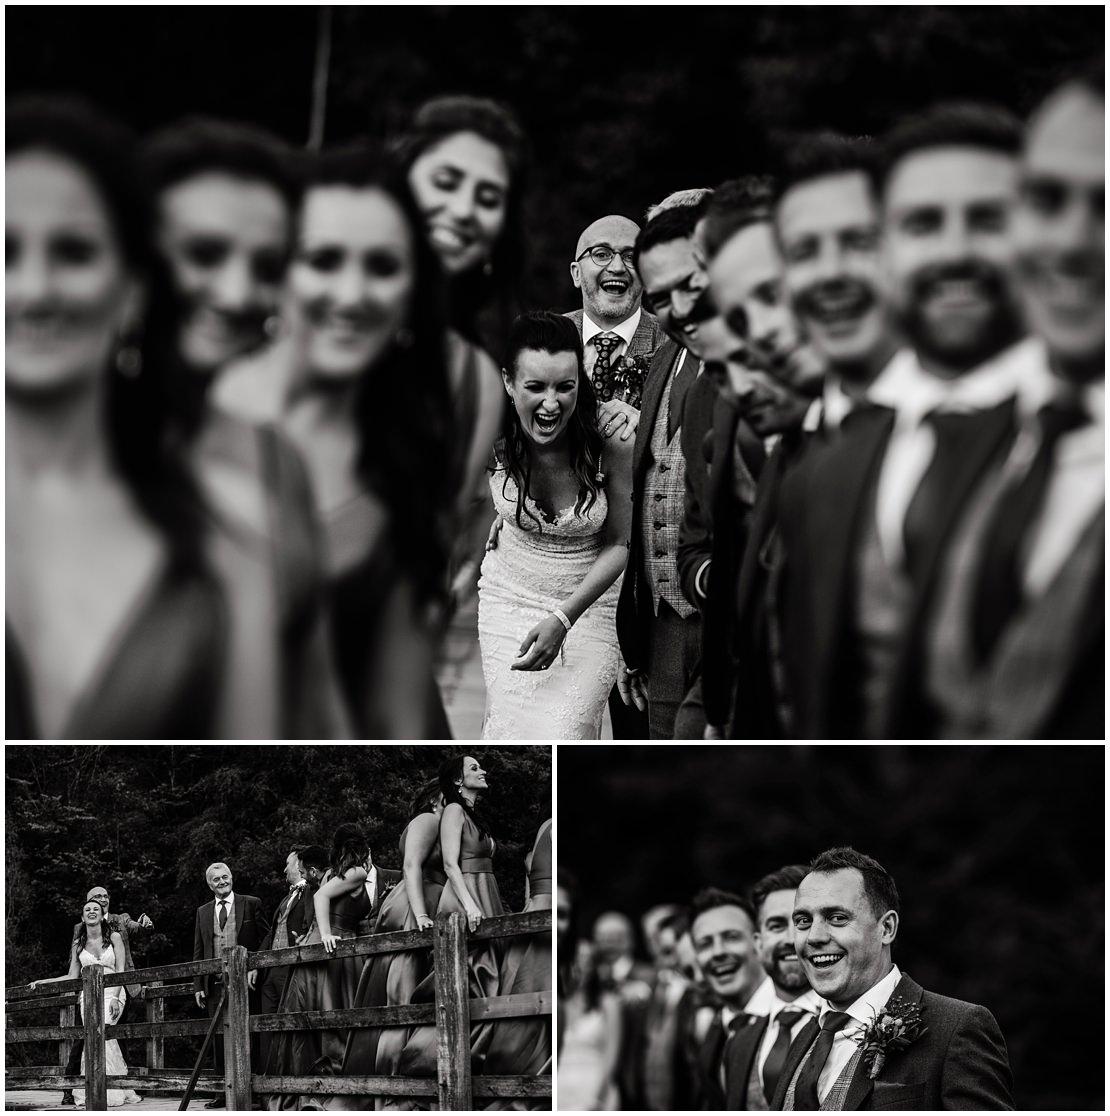 Bolton Abbey Tithe Barn Wedding Photographer 0150